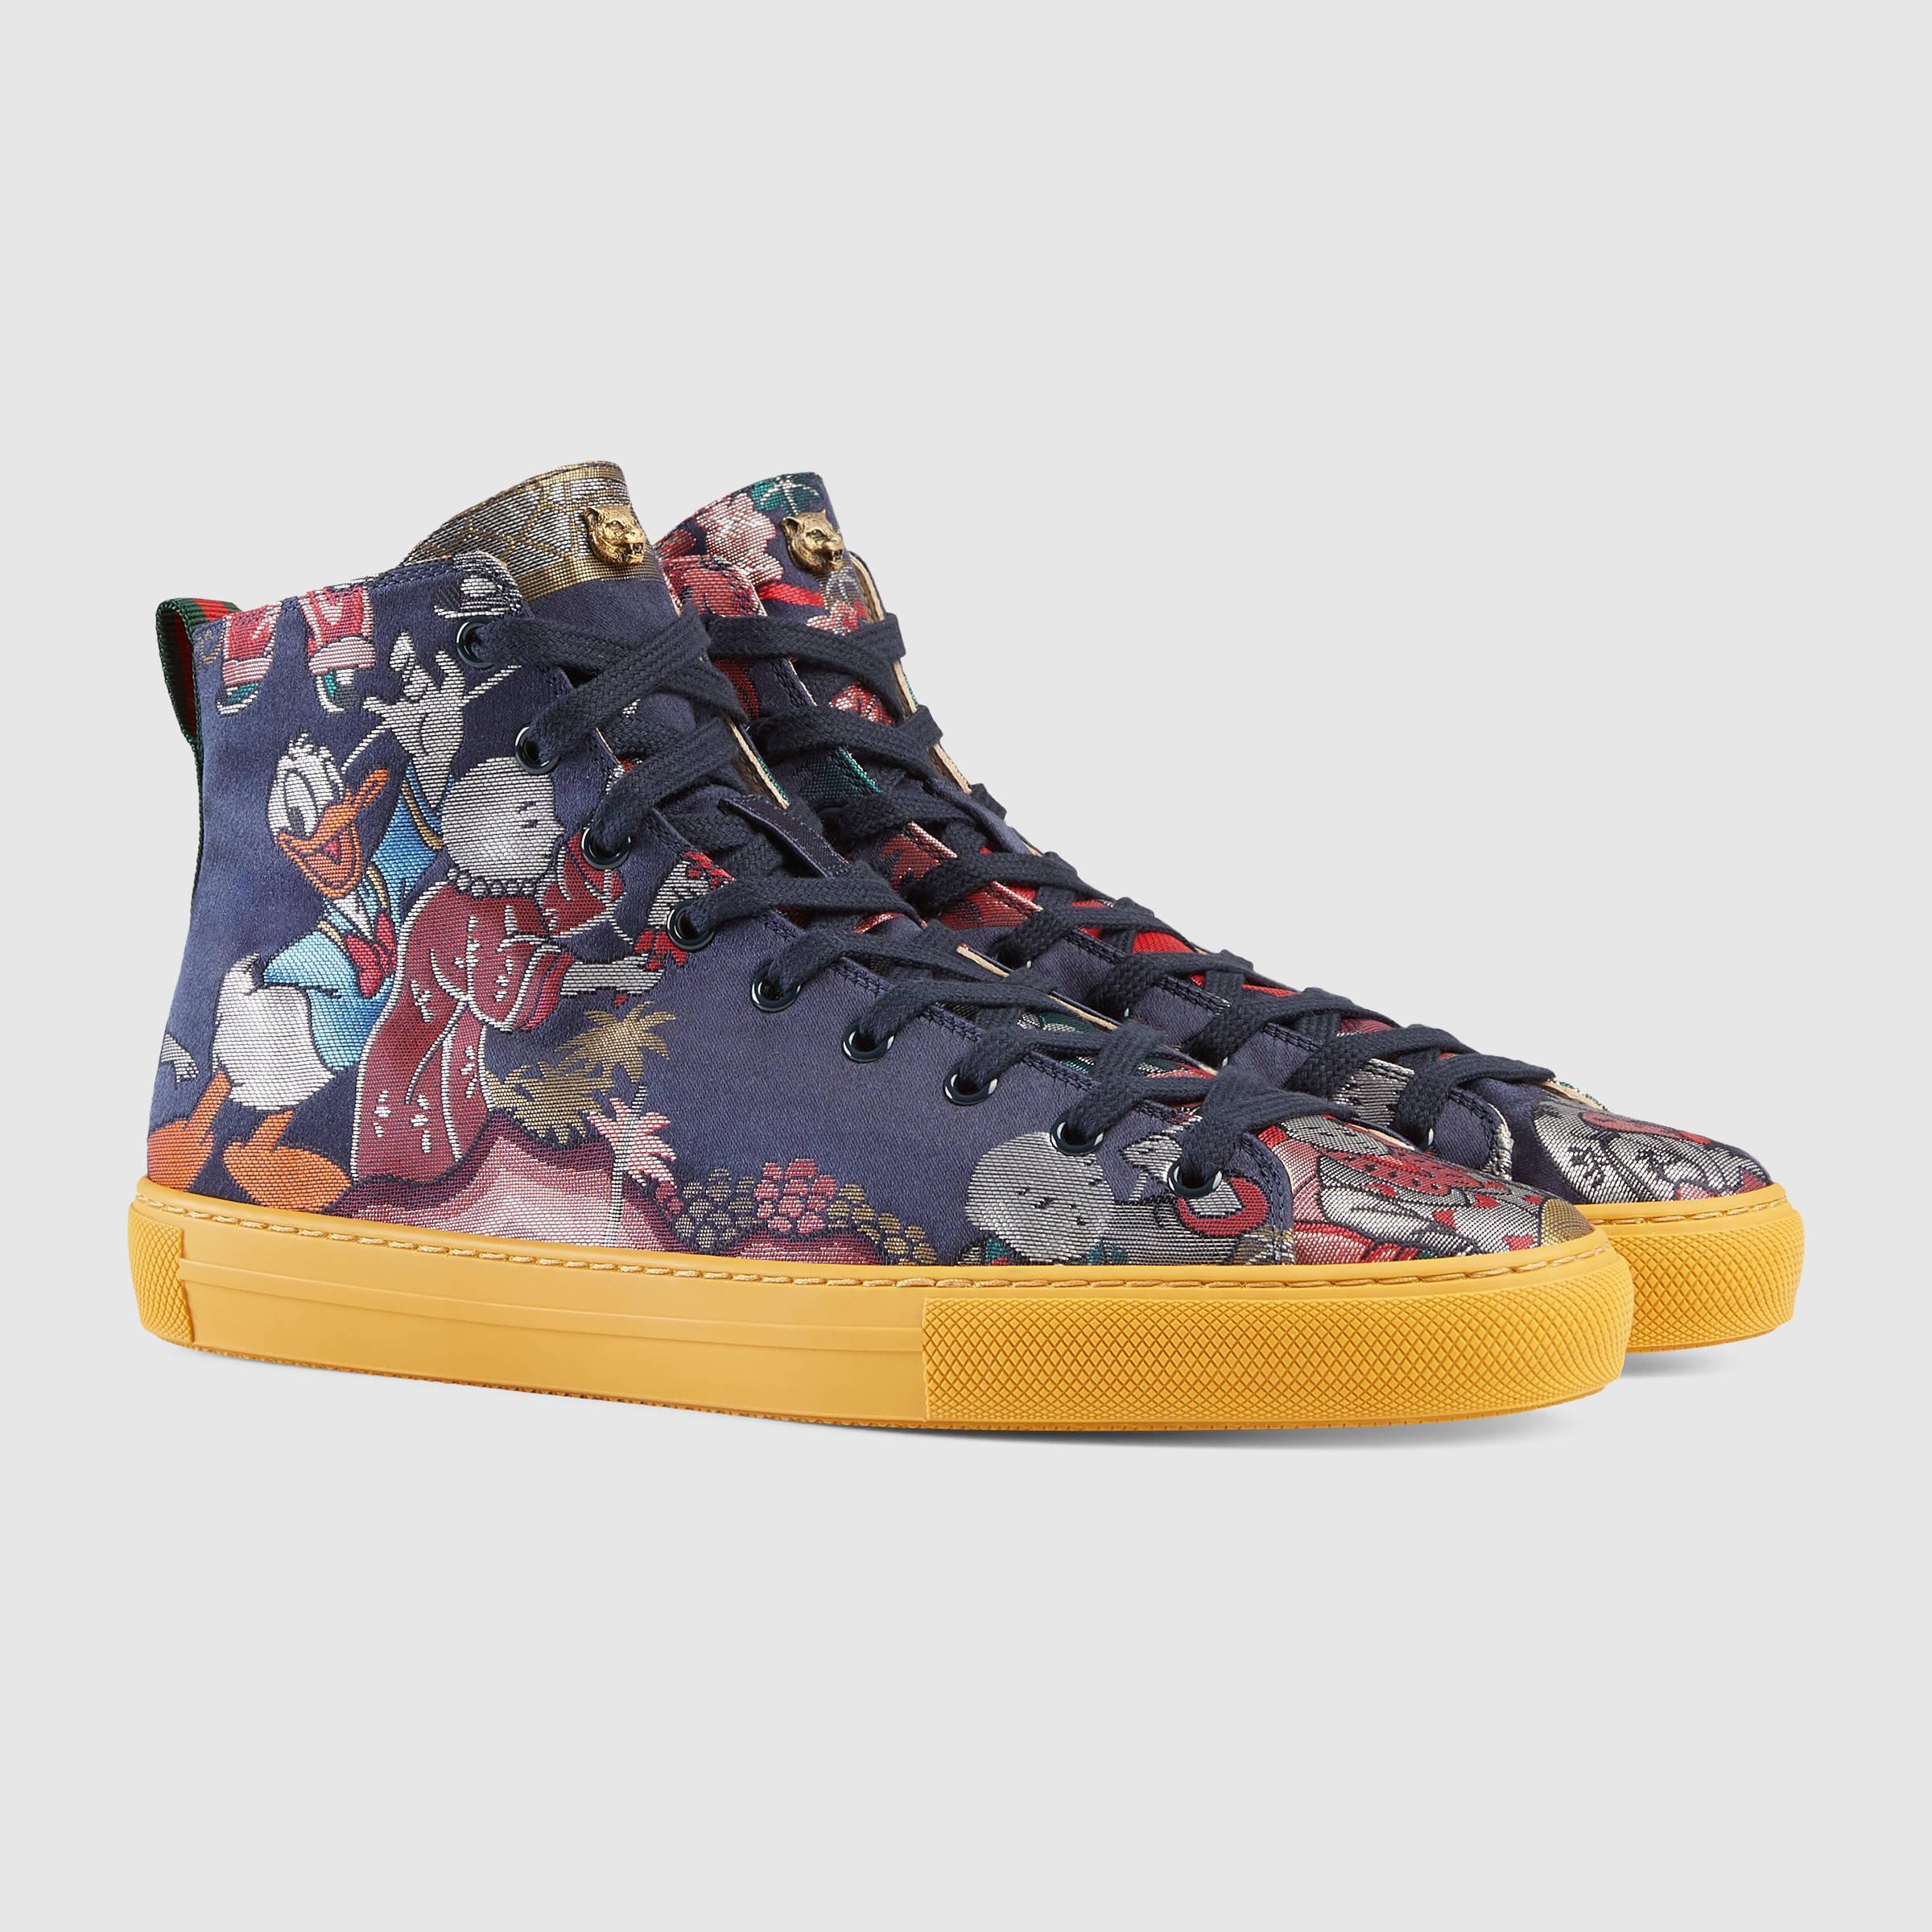 e0a5ebbf4a69 Gucci Donald Duck Jacquard High-top Sneaker in Blue - Lyst